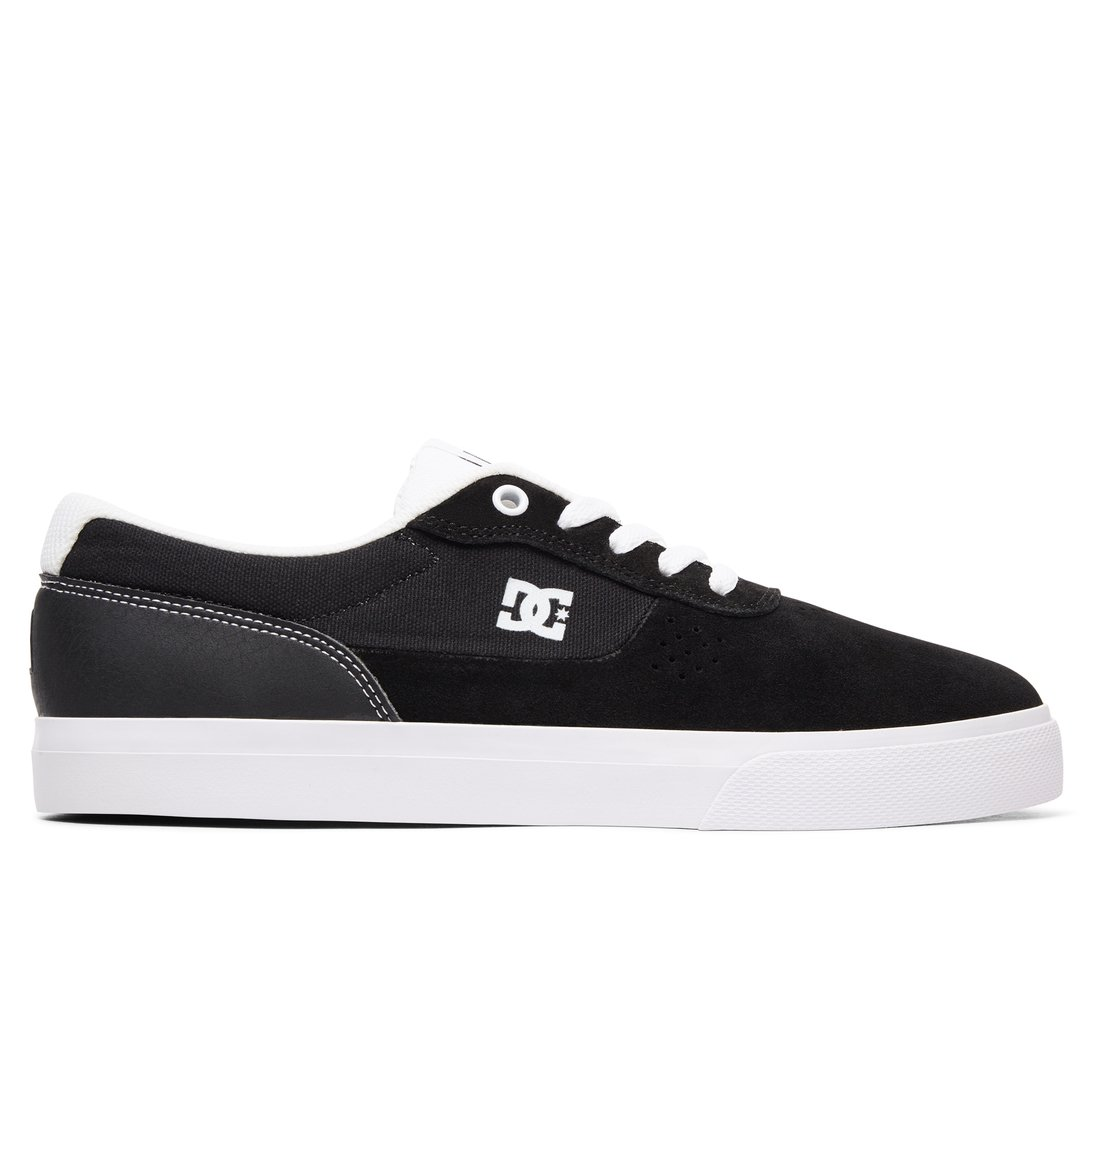 Chaussures ADYS300104 pour Shoes DC skate de S Switch Homme vBwz41